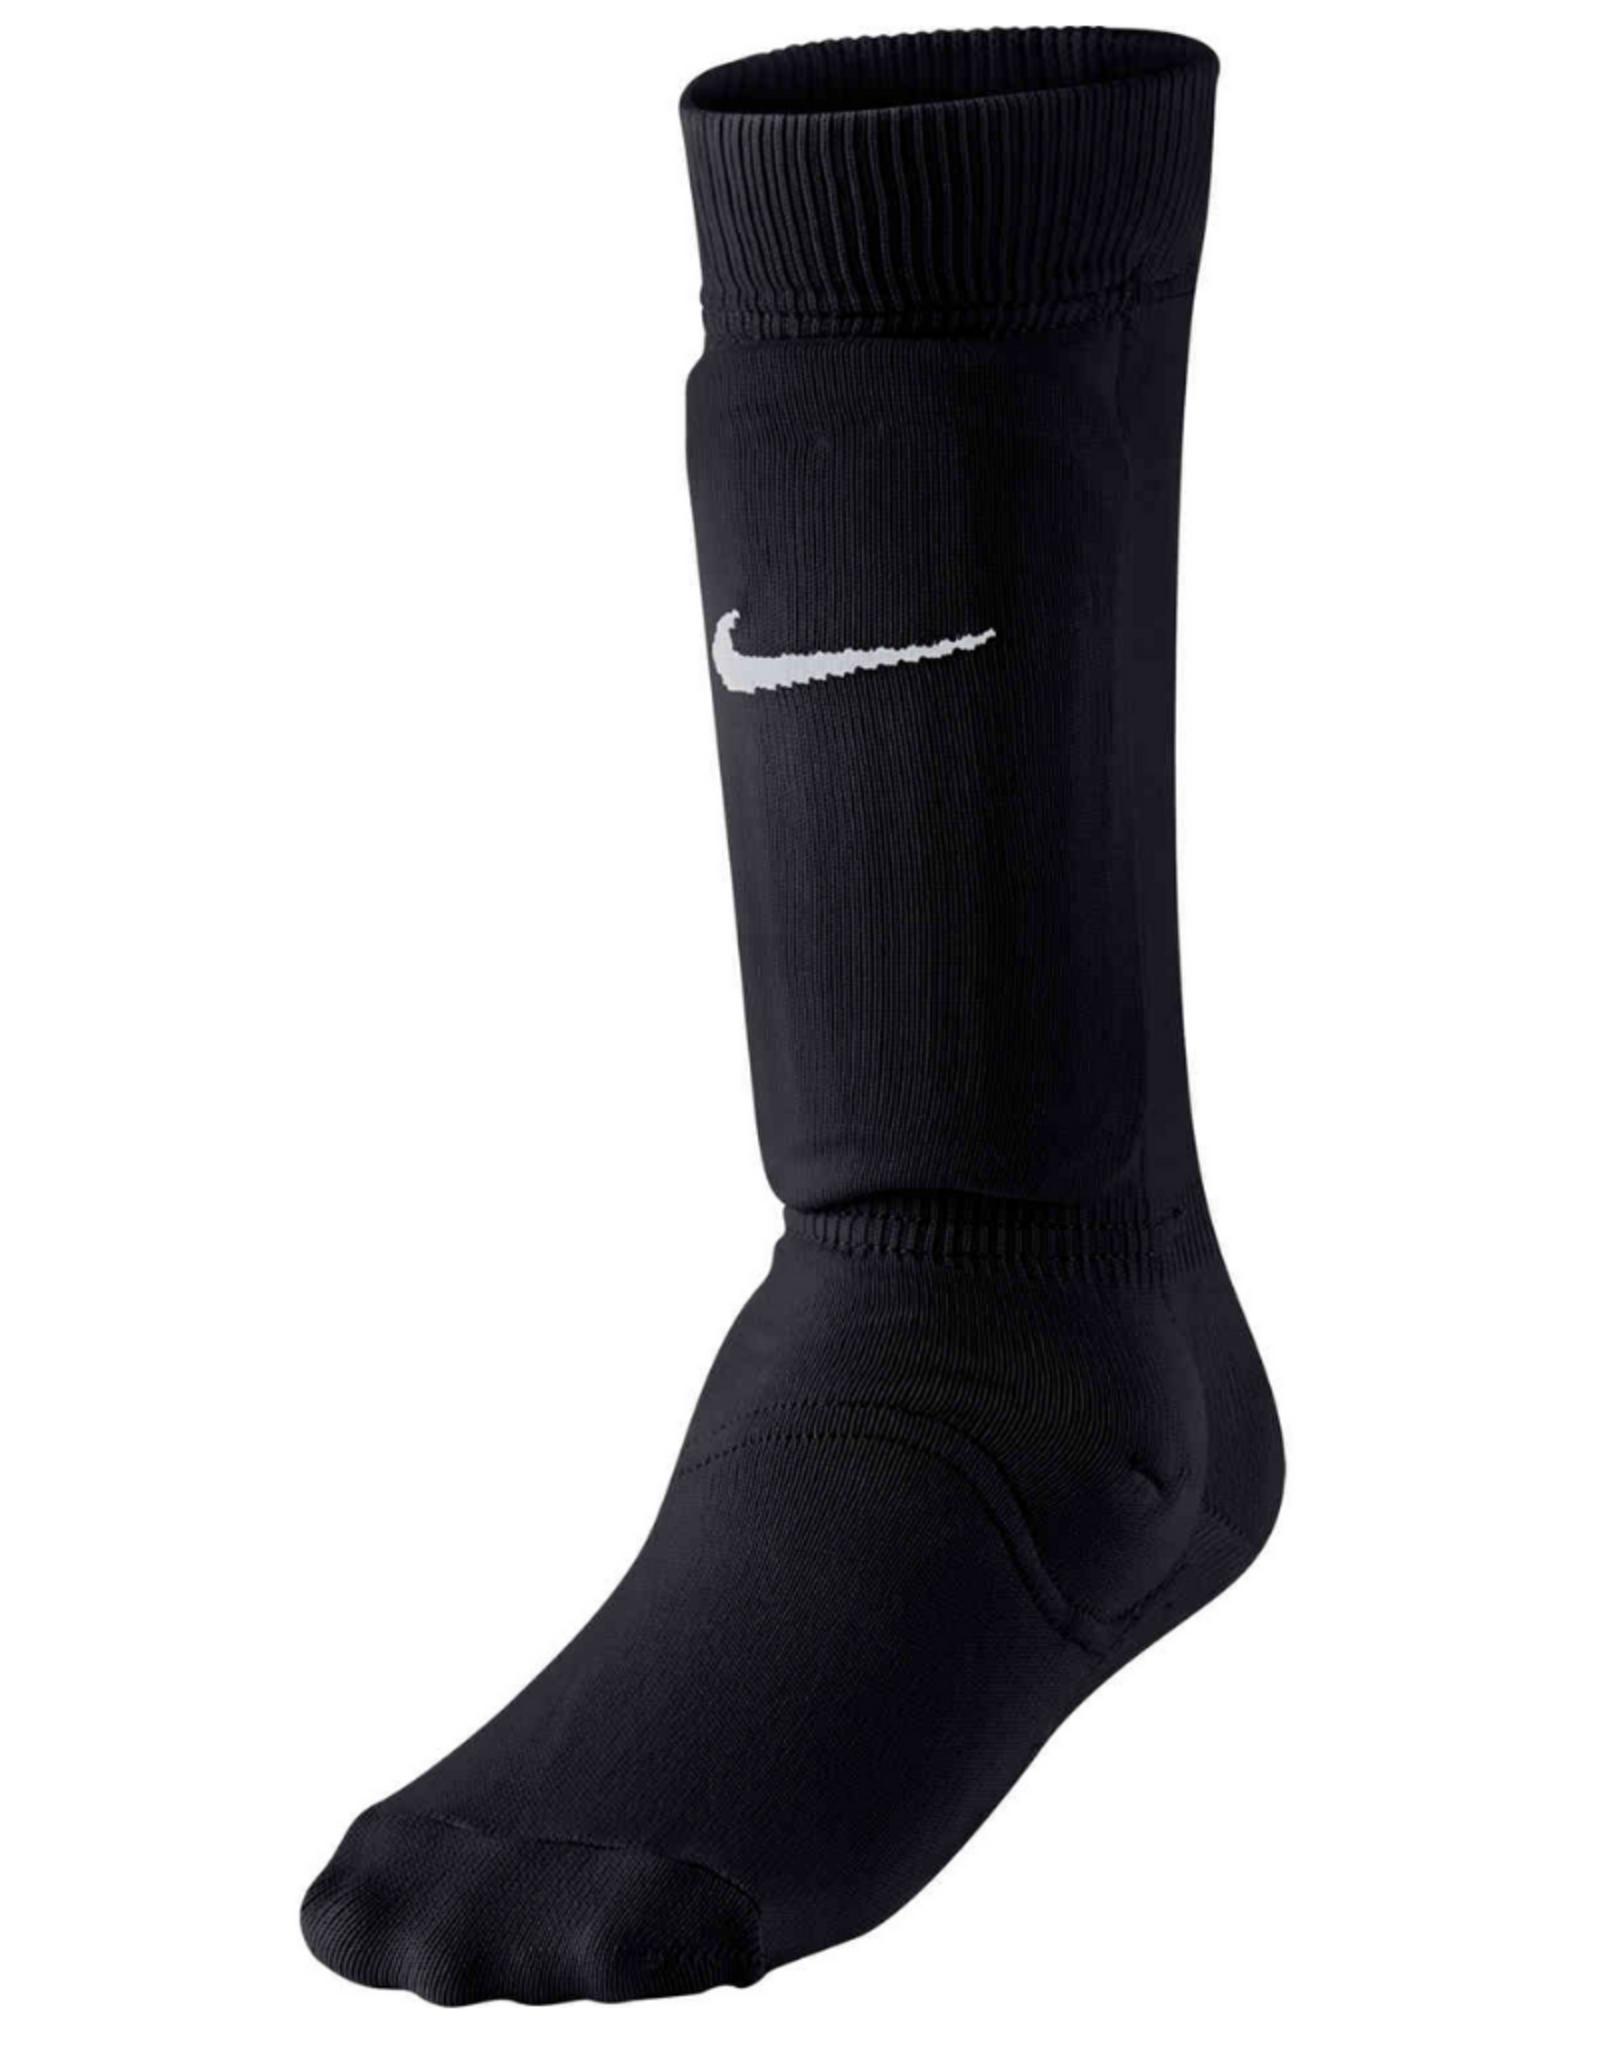 Nike Youth Shin Sock Guards Black